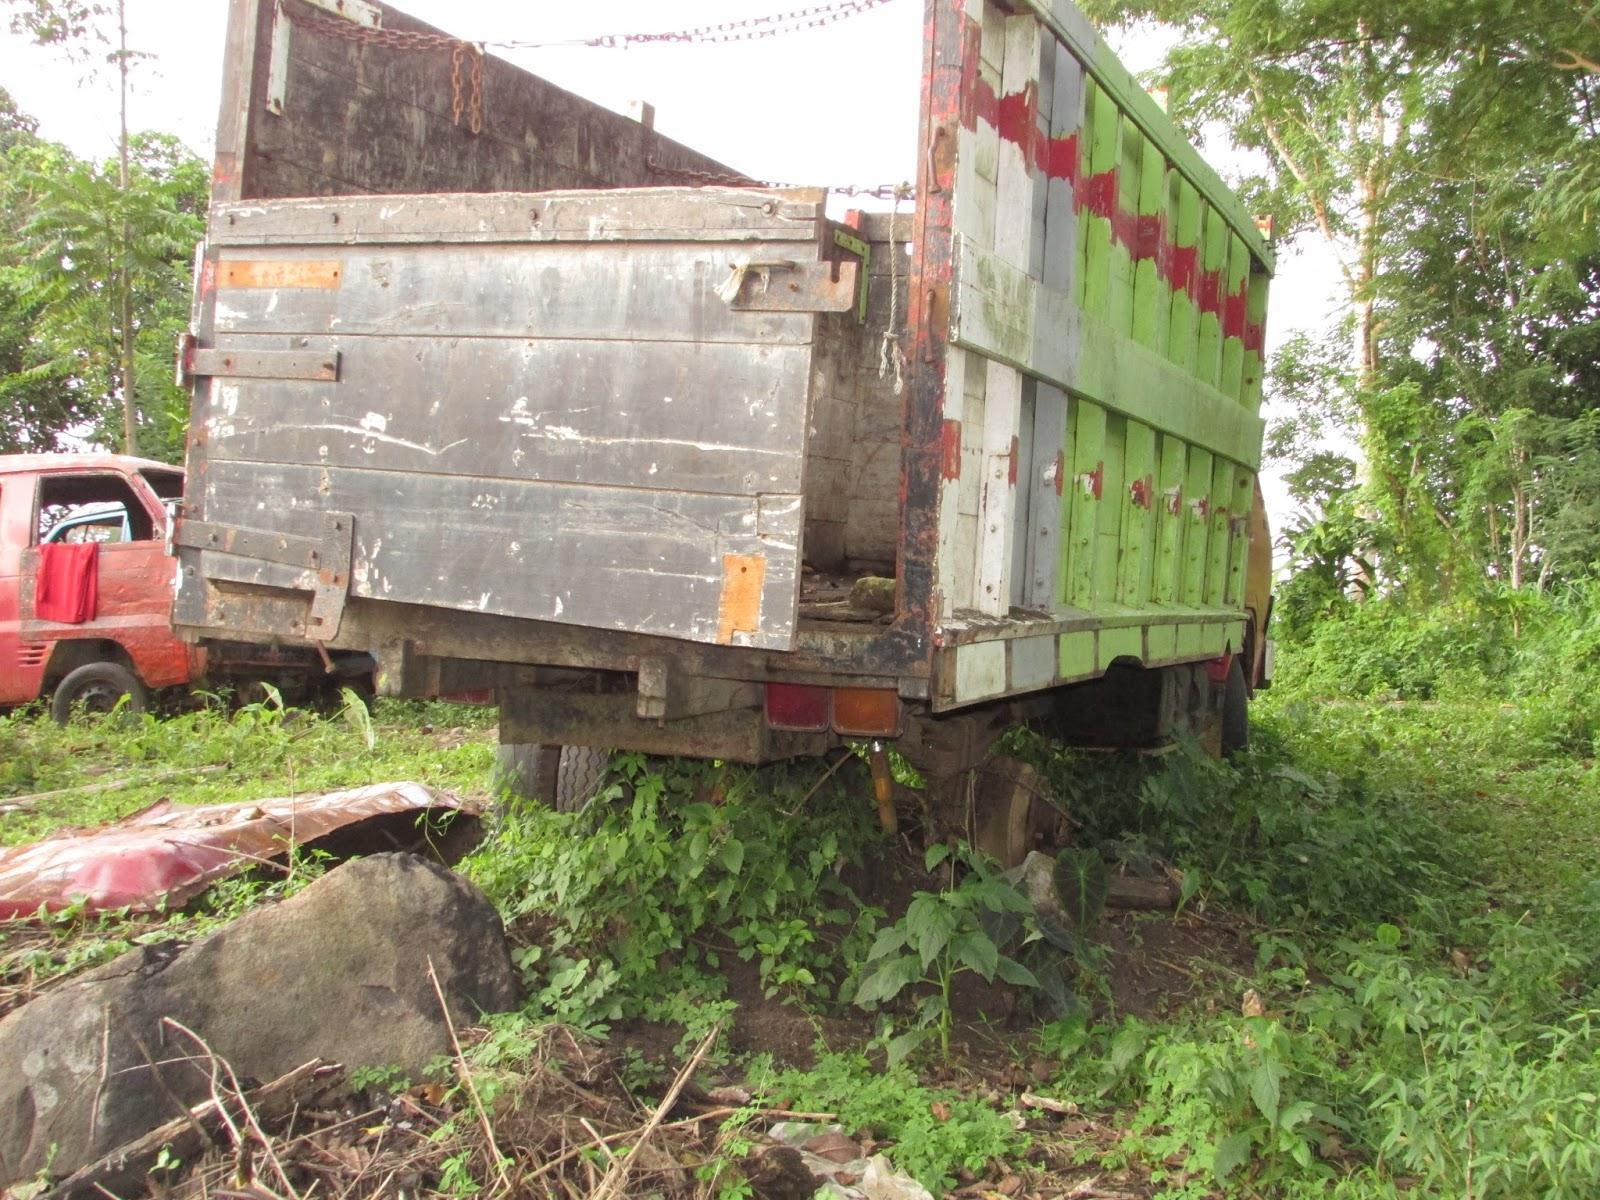 66 Gambar Mobil Rongsokan HD